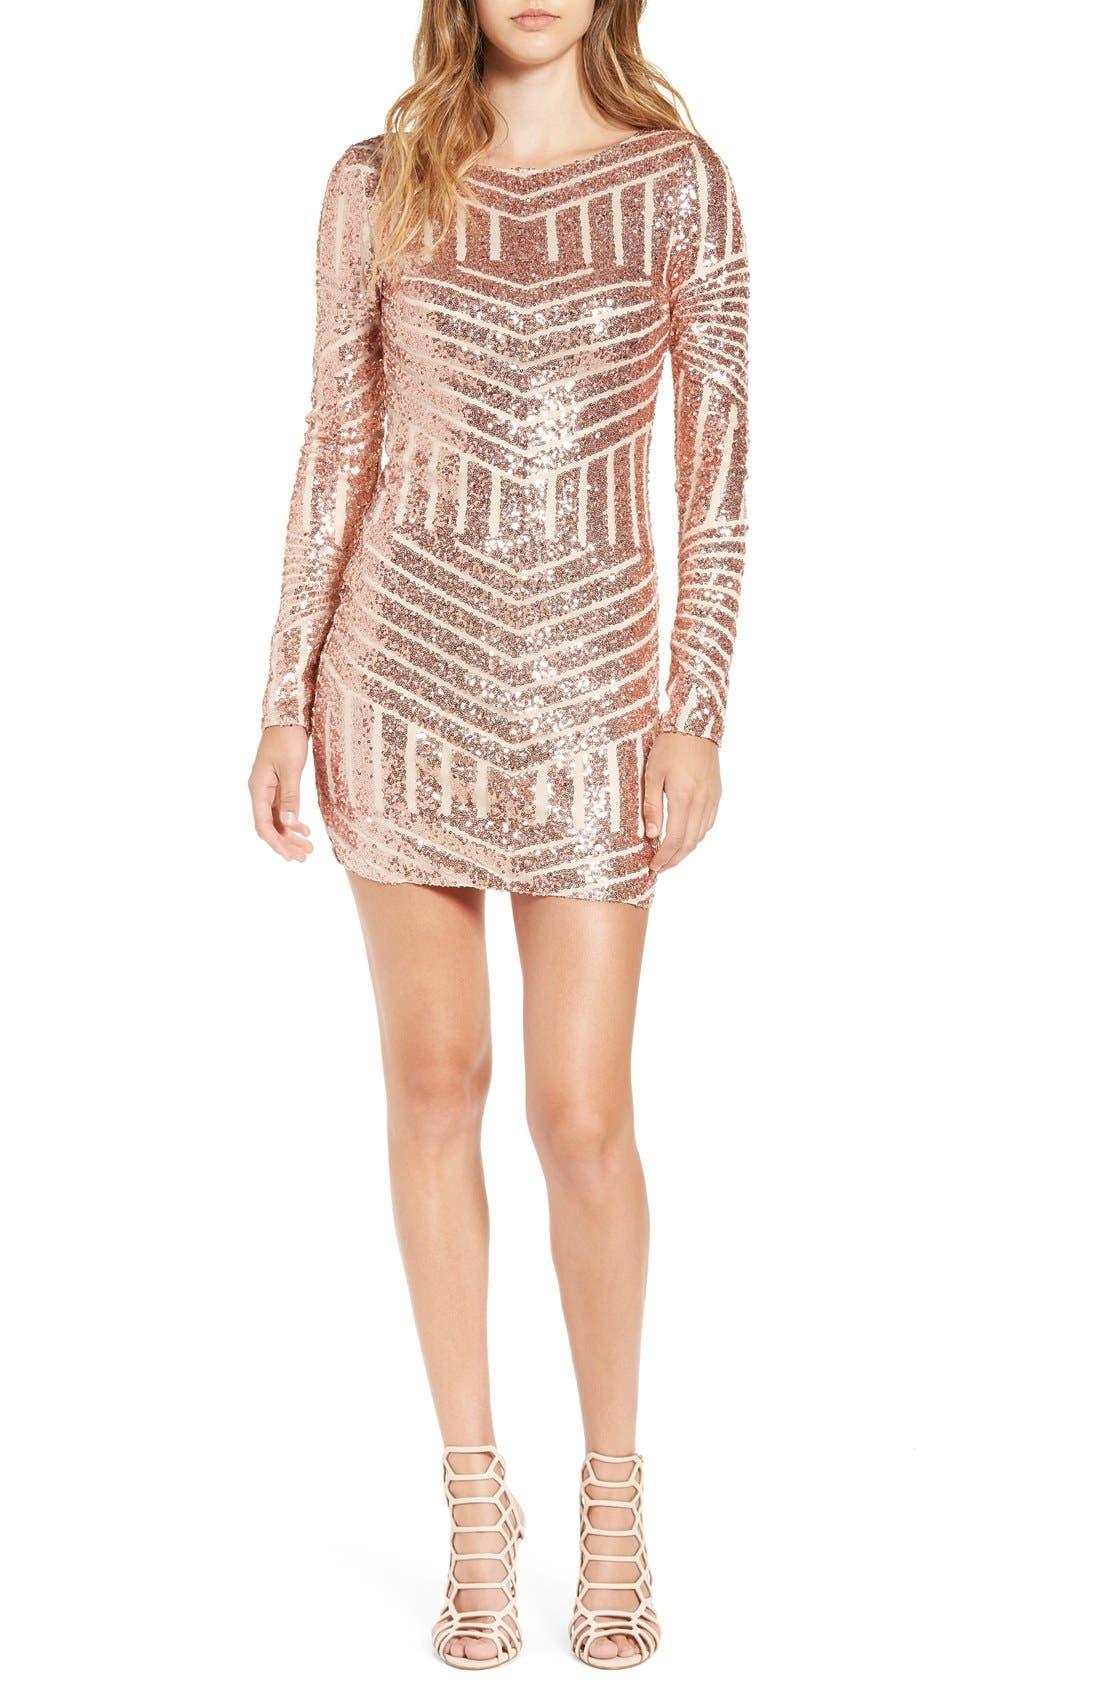 Alternate Image 1 Selected - Bee Darlin Long Sleeve Sequin Body-Con Dress